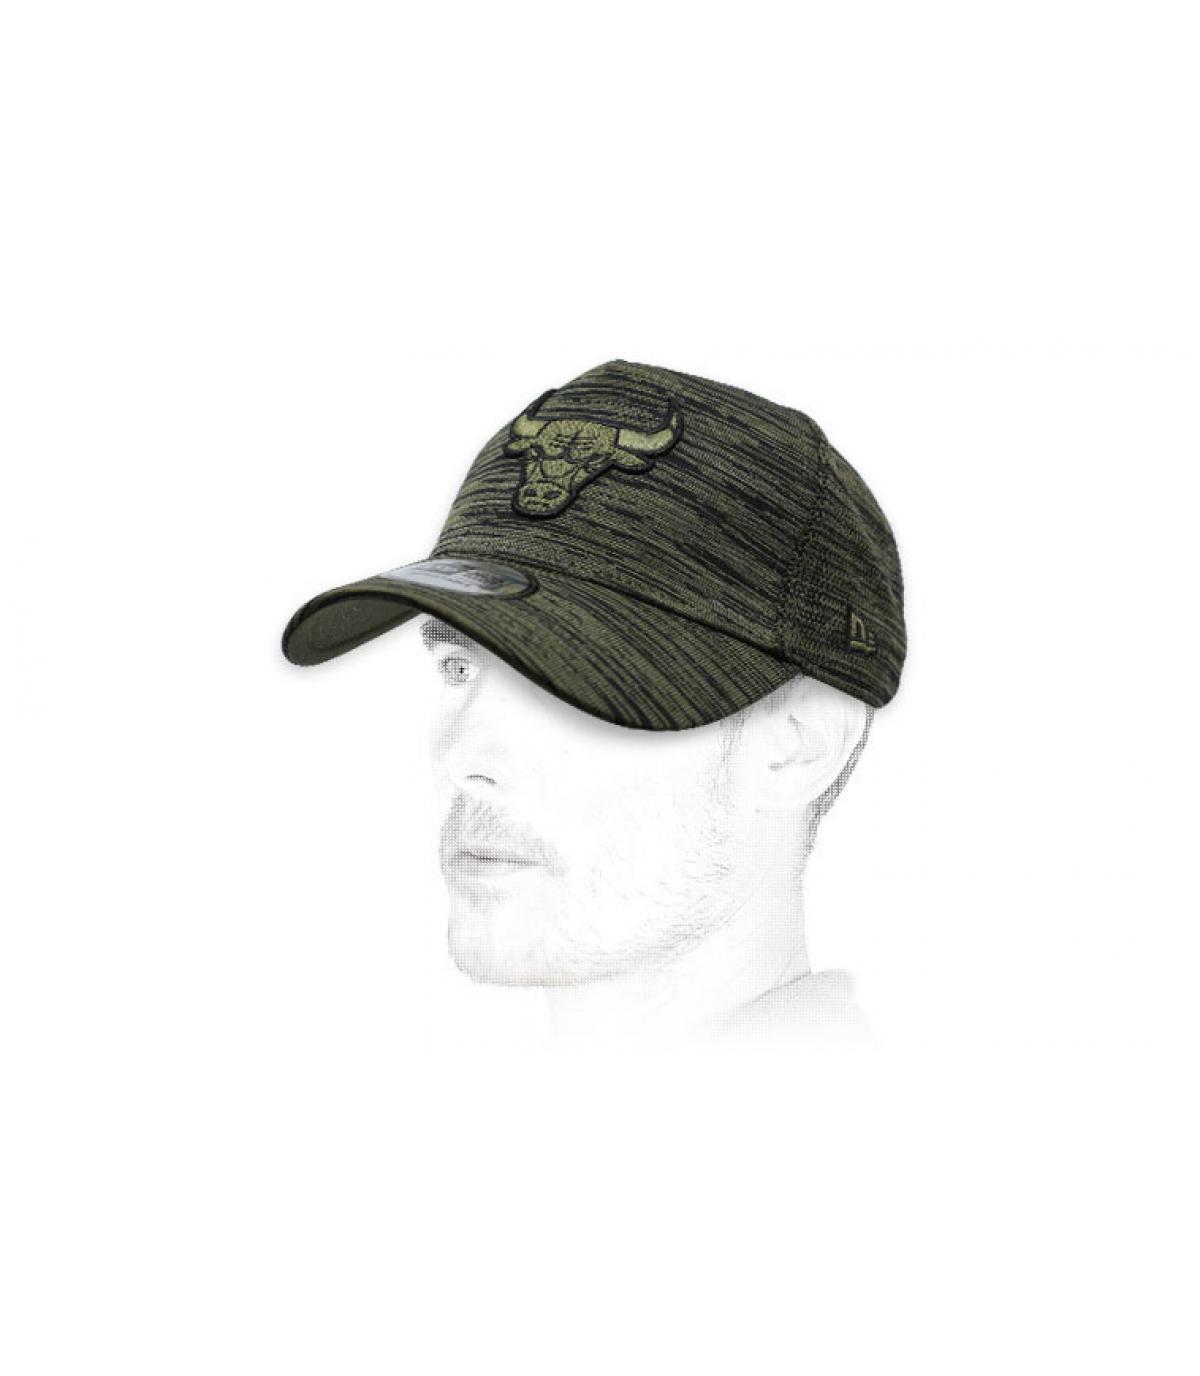 heather green Bulls cap